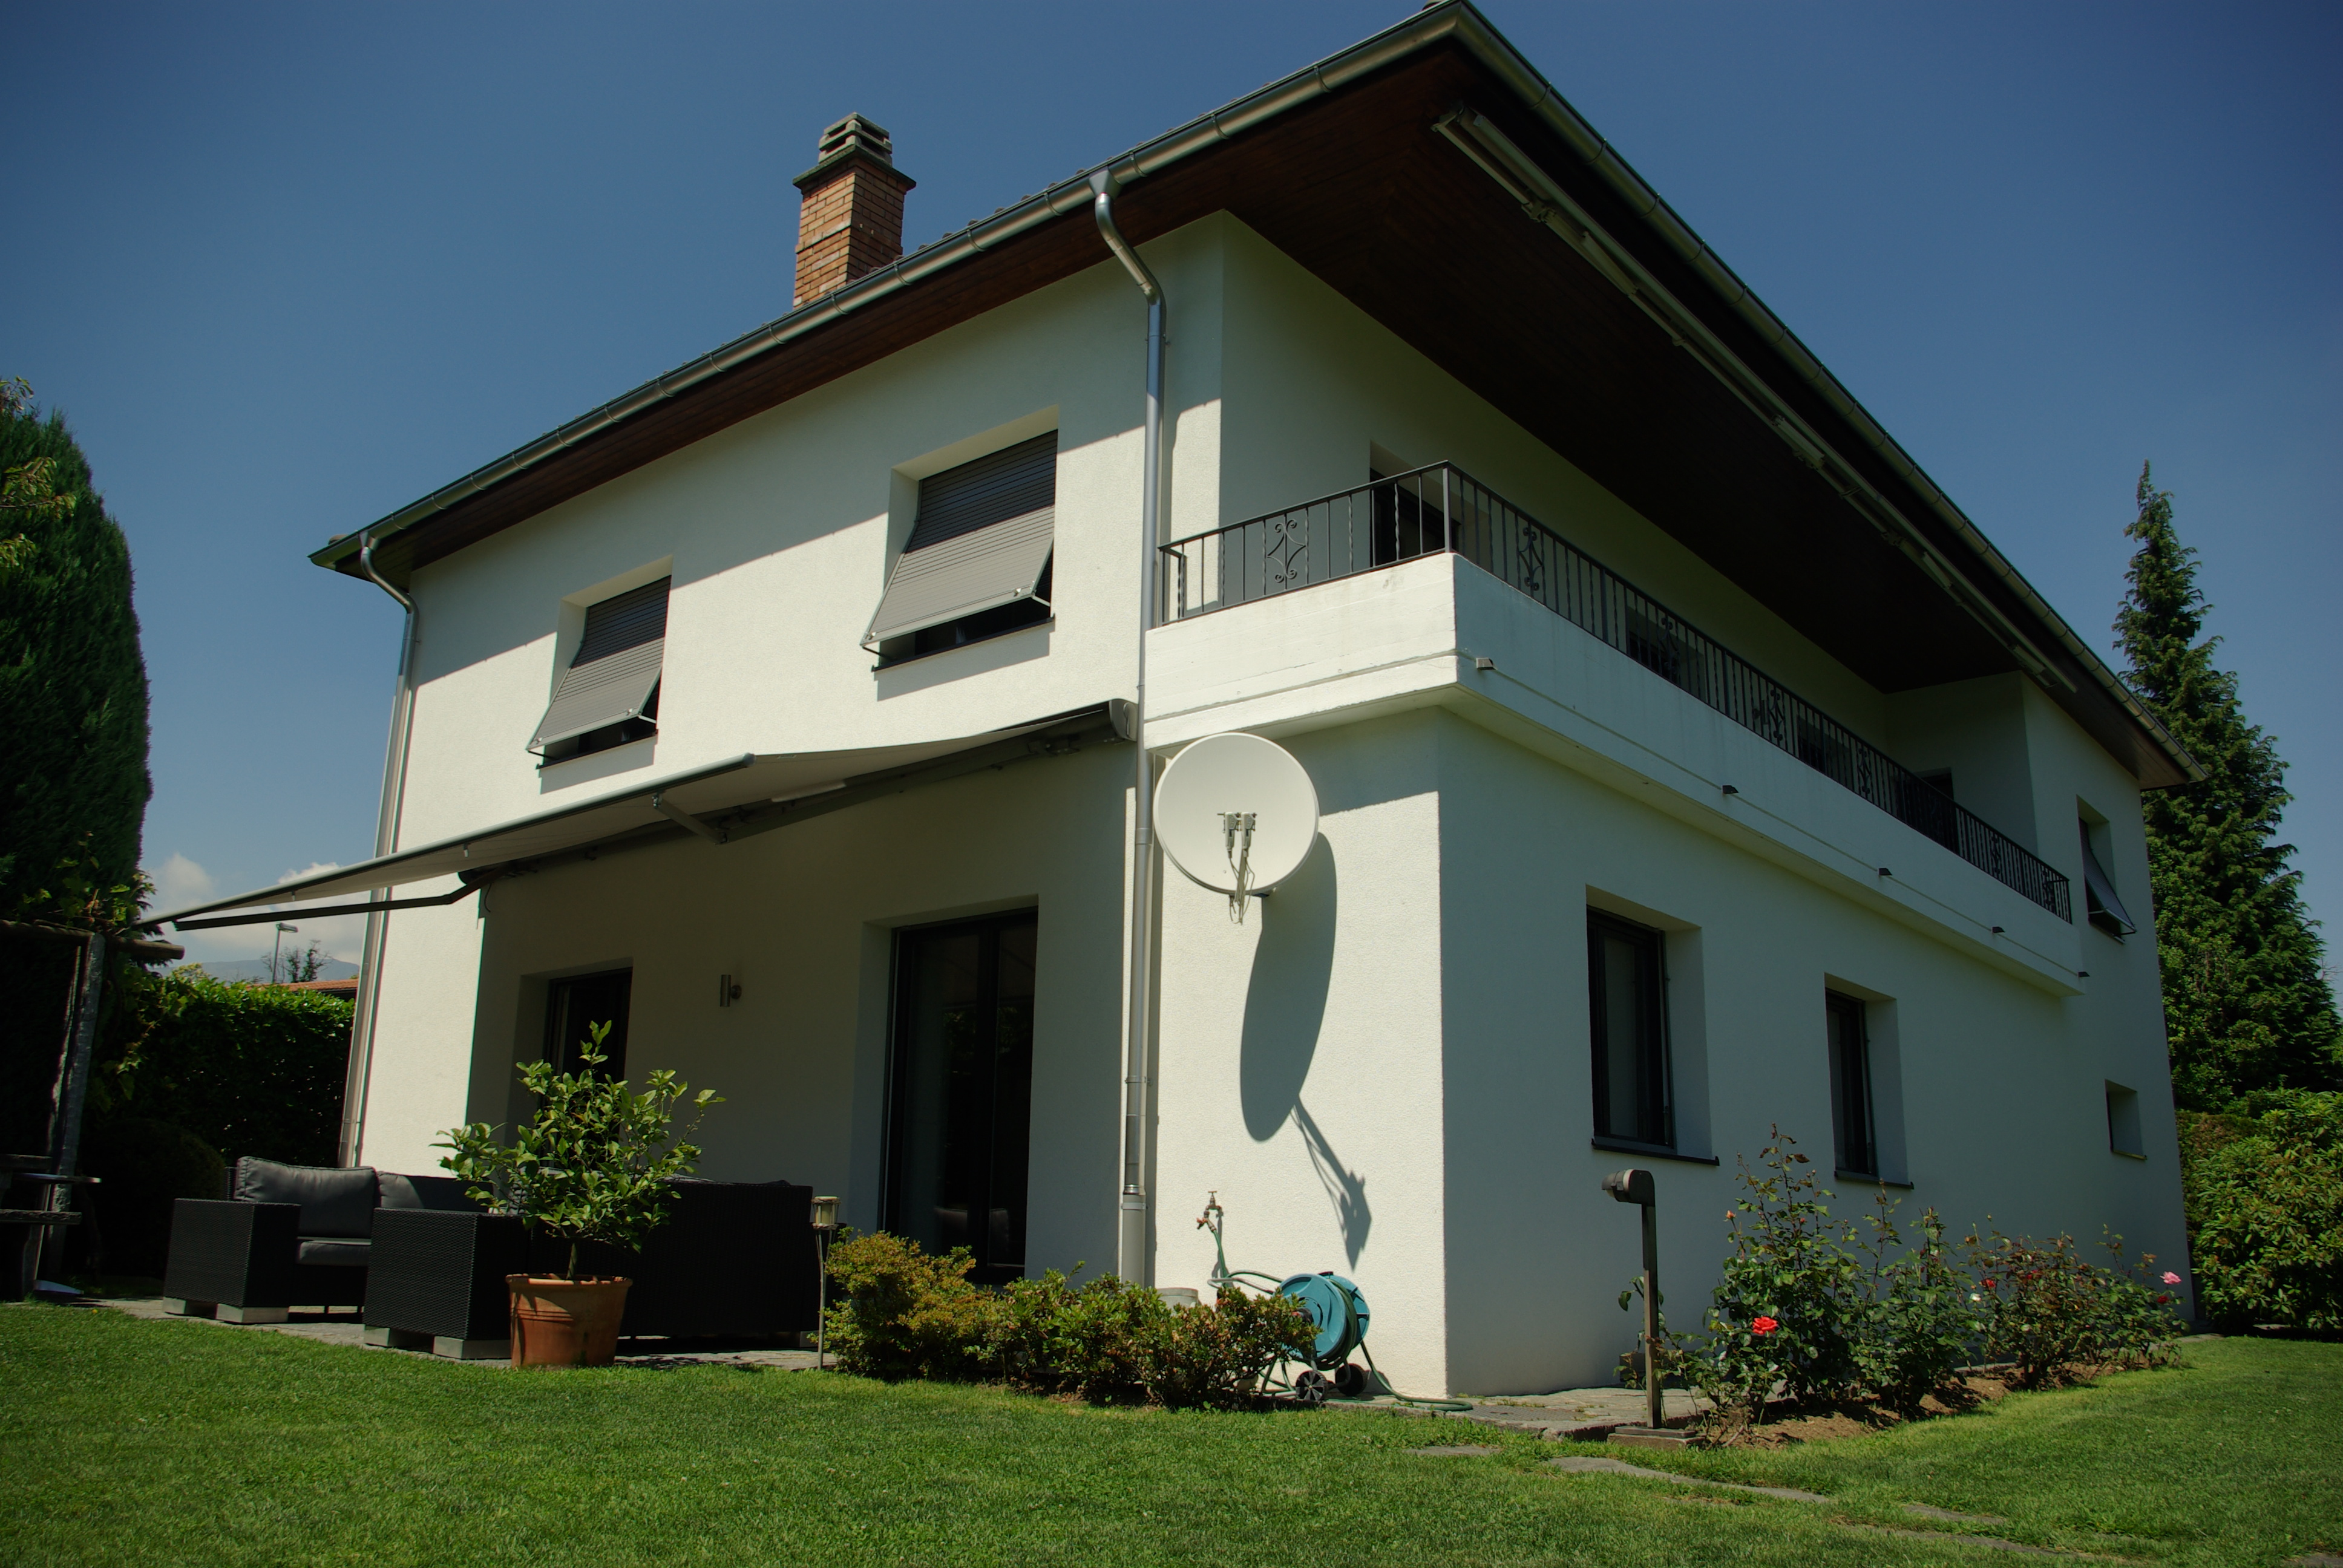 BREGANZONA – Bellissima casa unifamiliare in zona verde con bella vista